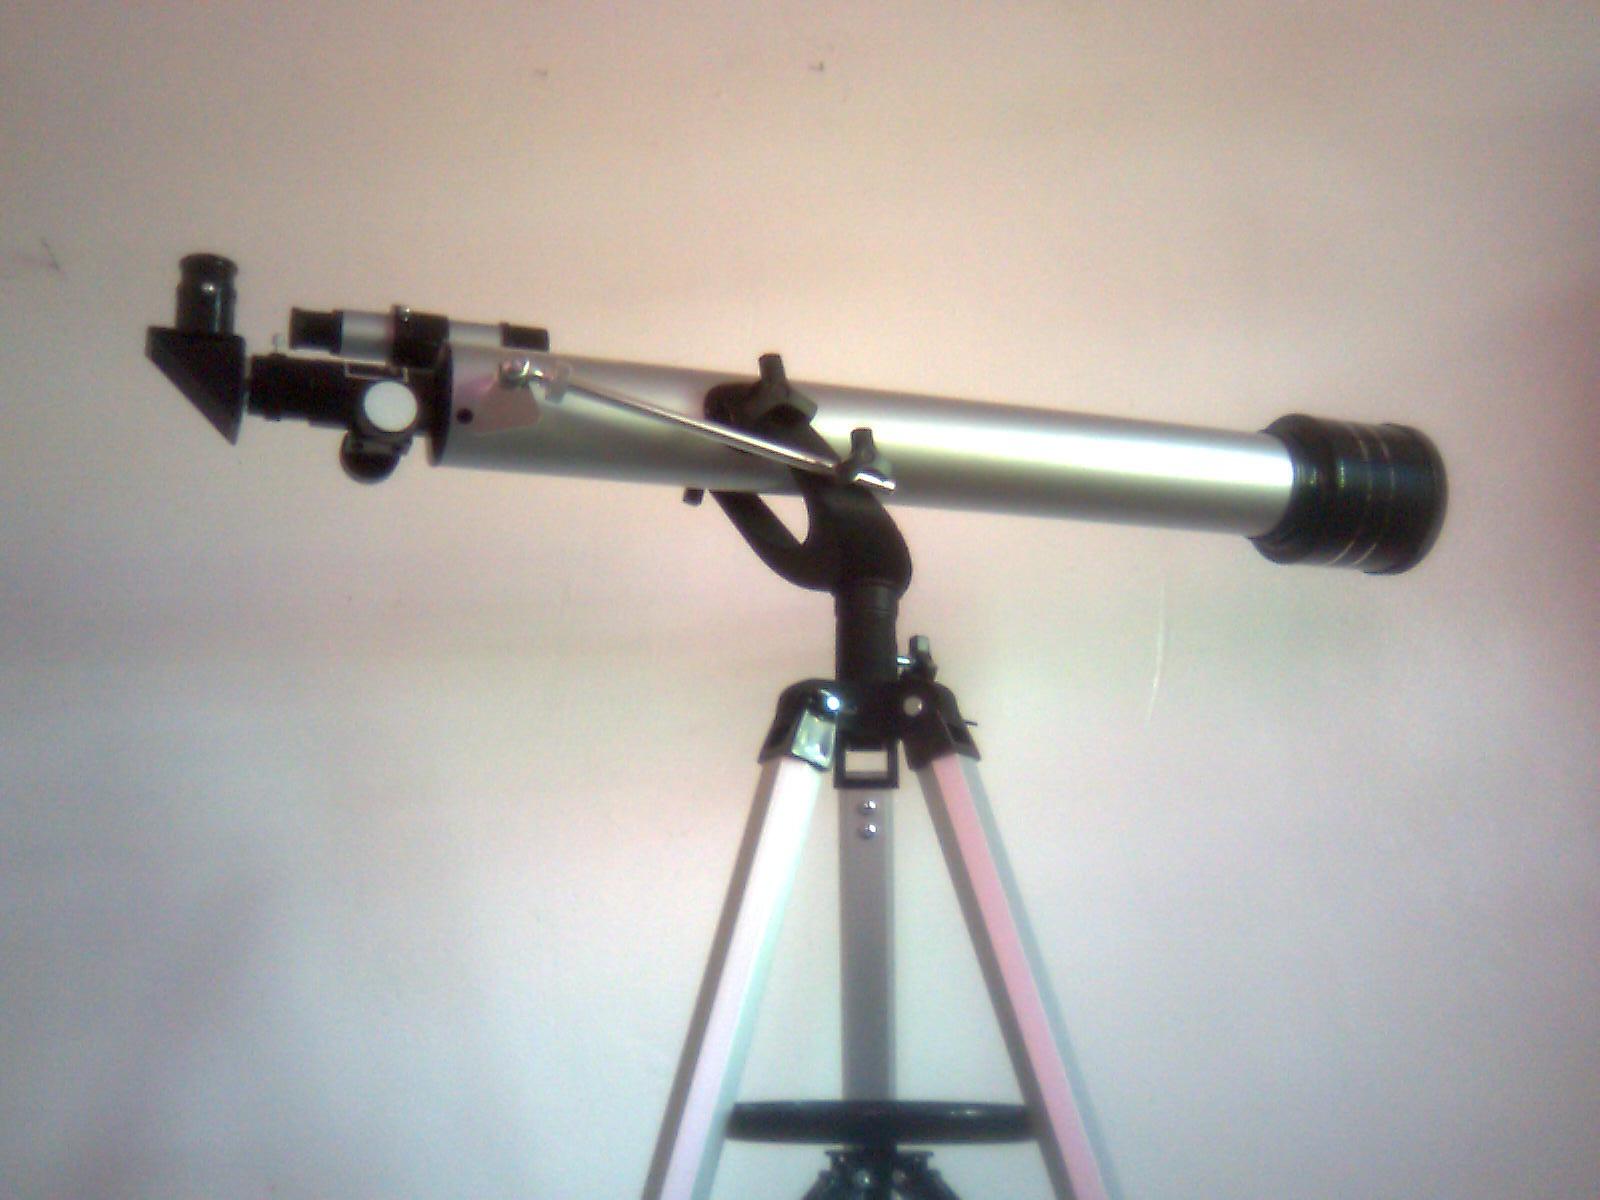 Teleskop astronomi fizik tingkatan 4: fakta fakta saintifik dalam al